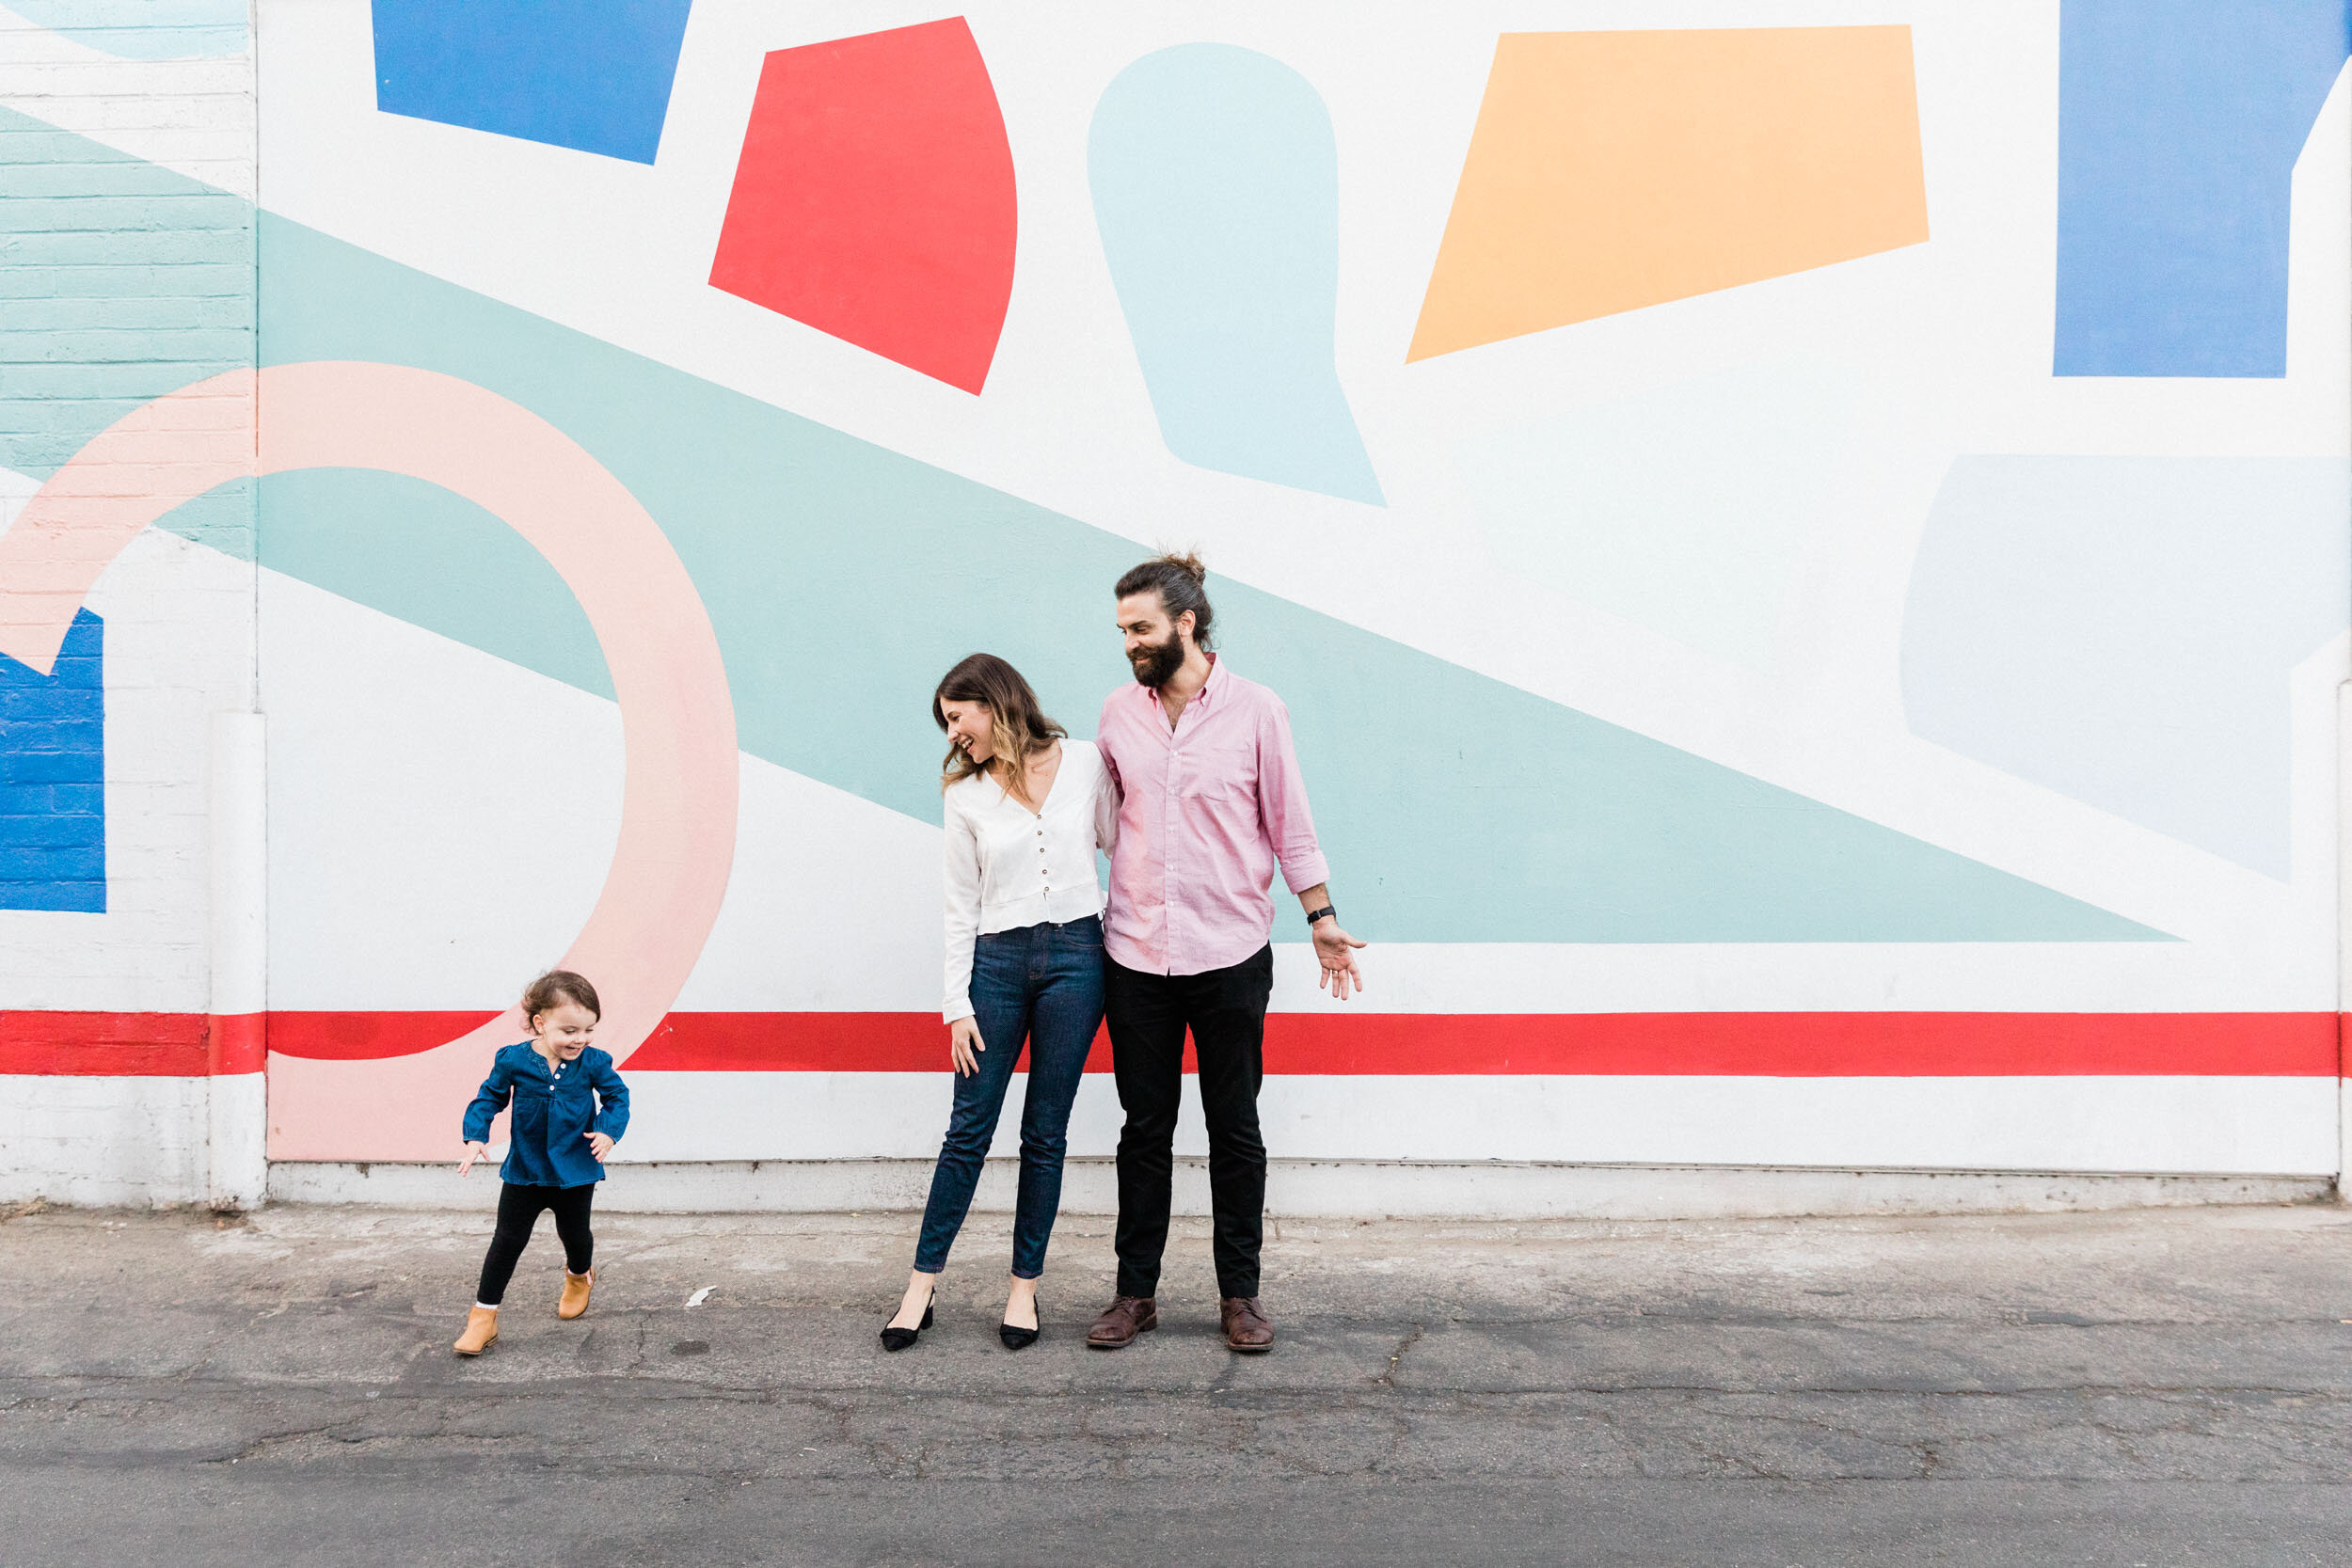 BKM-Photography-Highland-Park-Los-Angeles-Family-Photographer-NELA-Eagle-Rock-Silver-Lake-Glendale-Photographer-0011.jpg